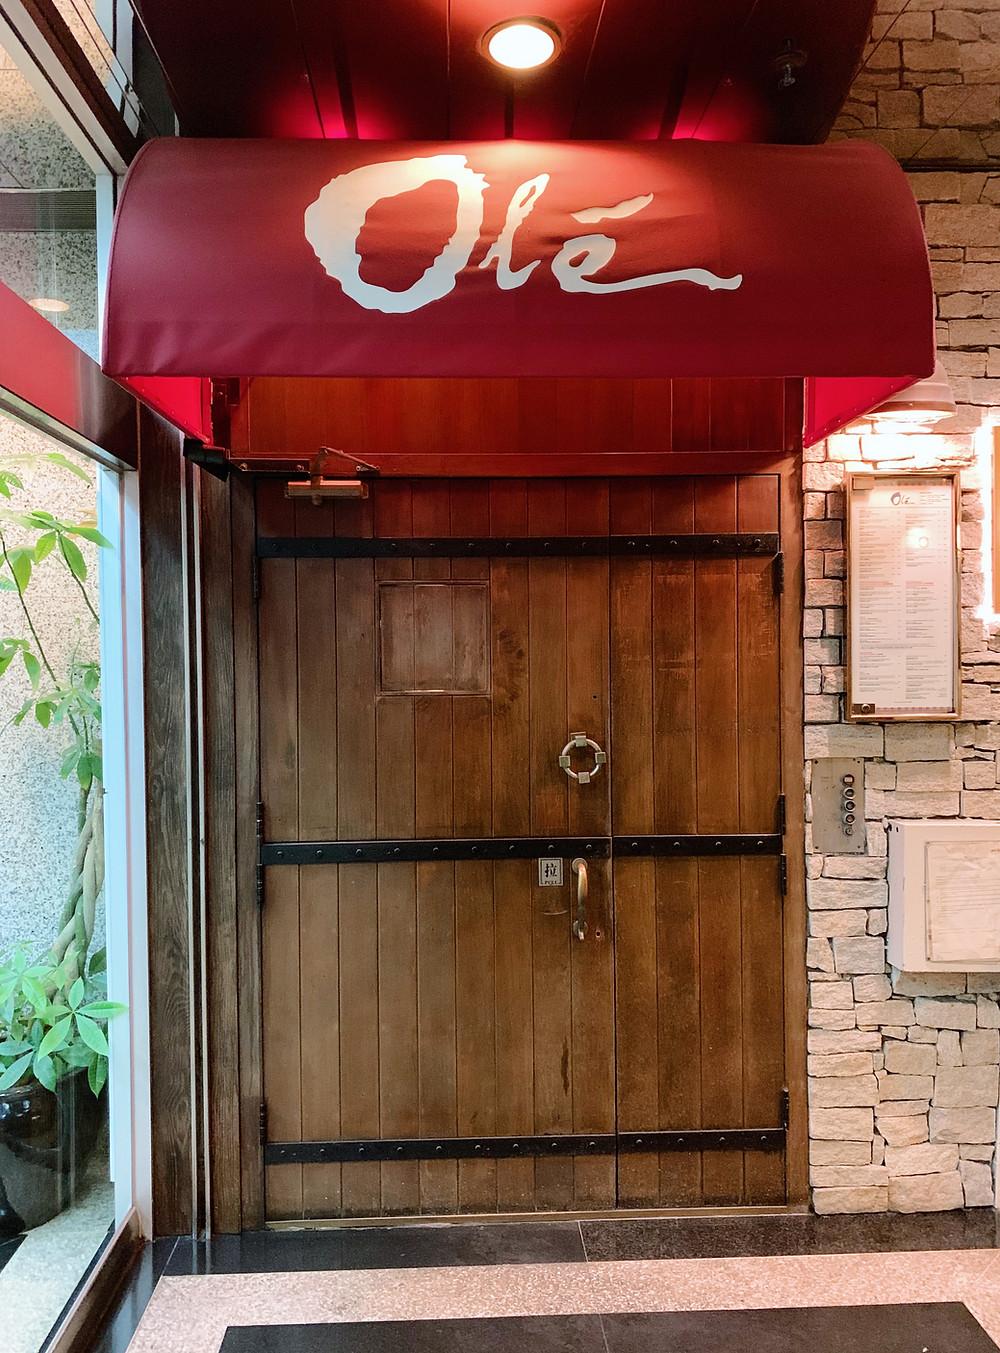 Ole restaurant in Hong Kong